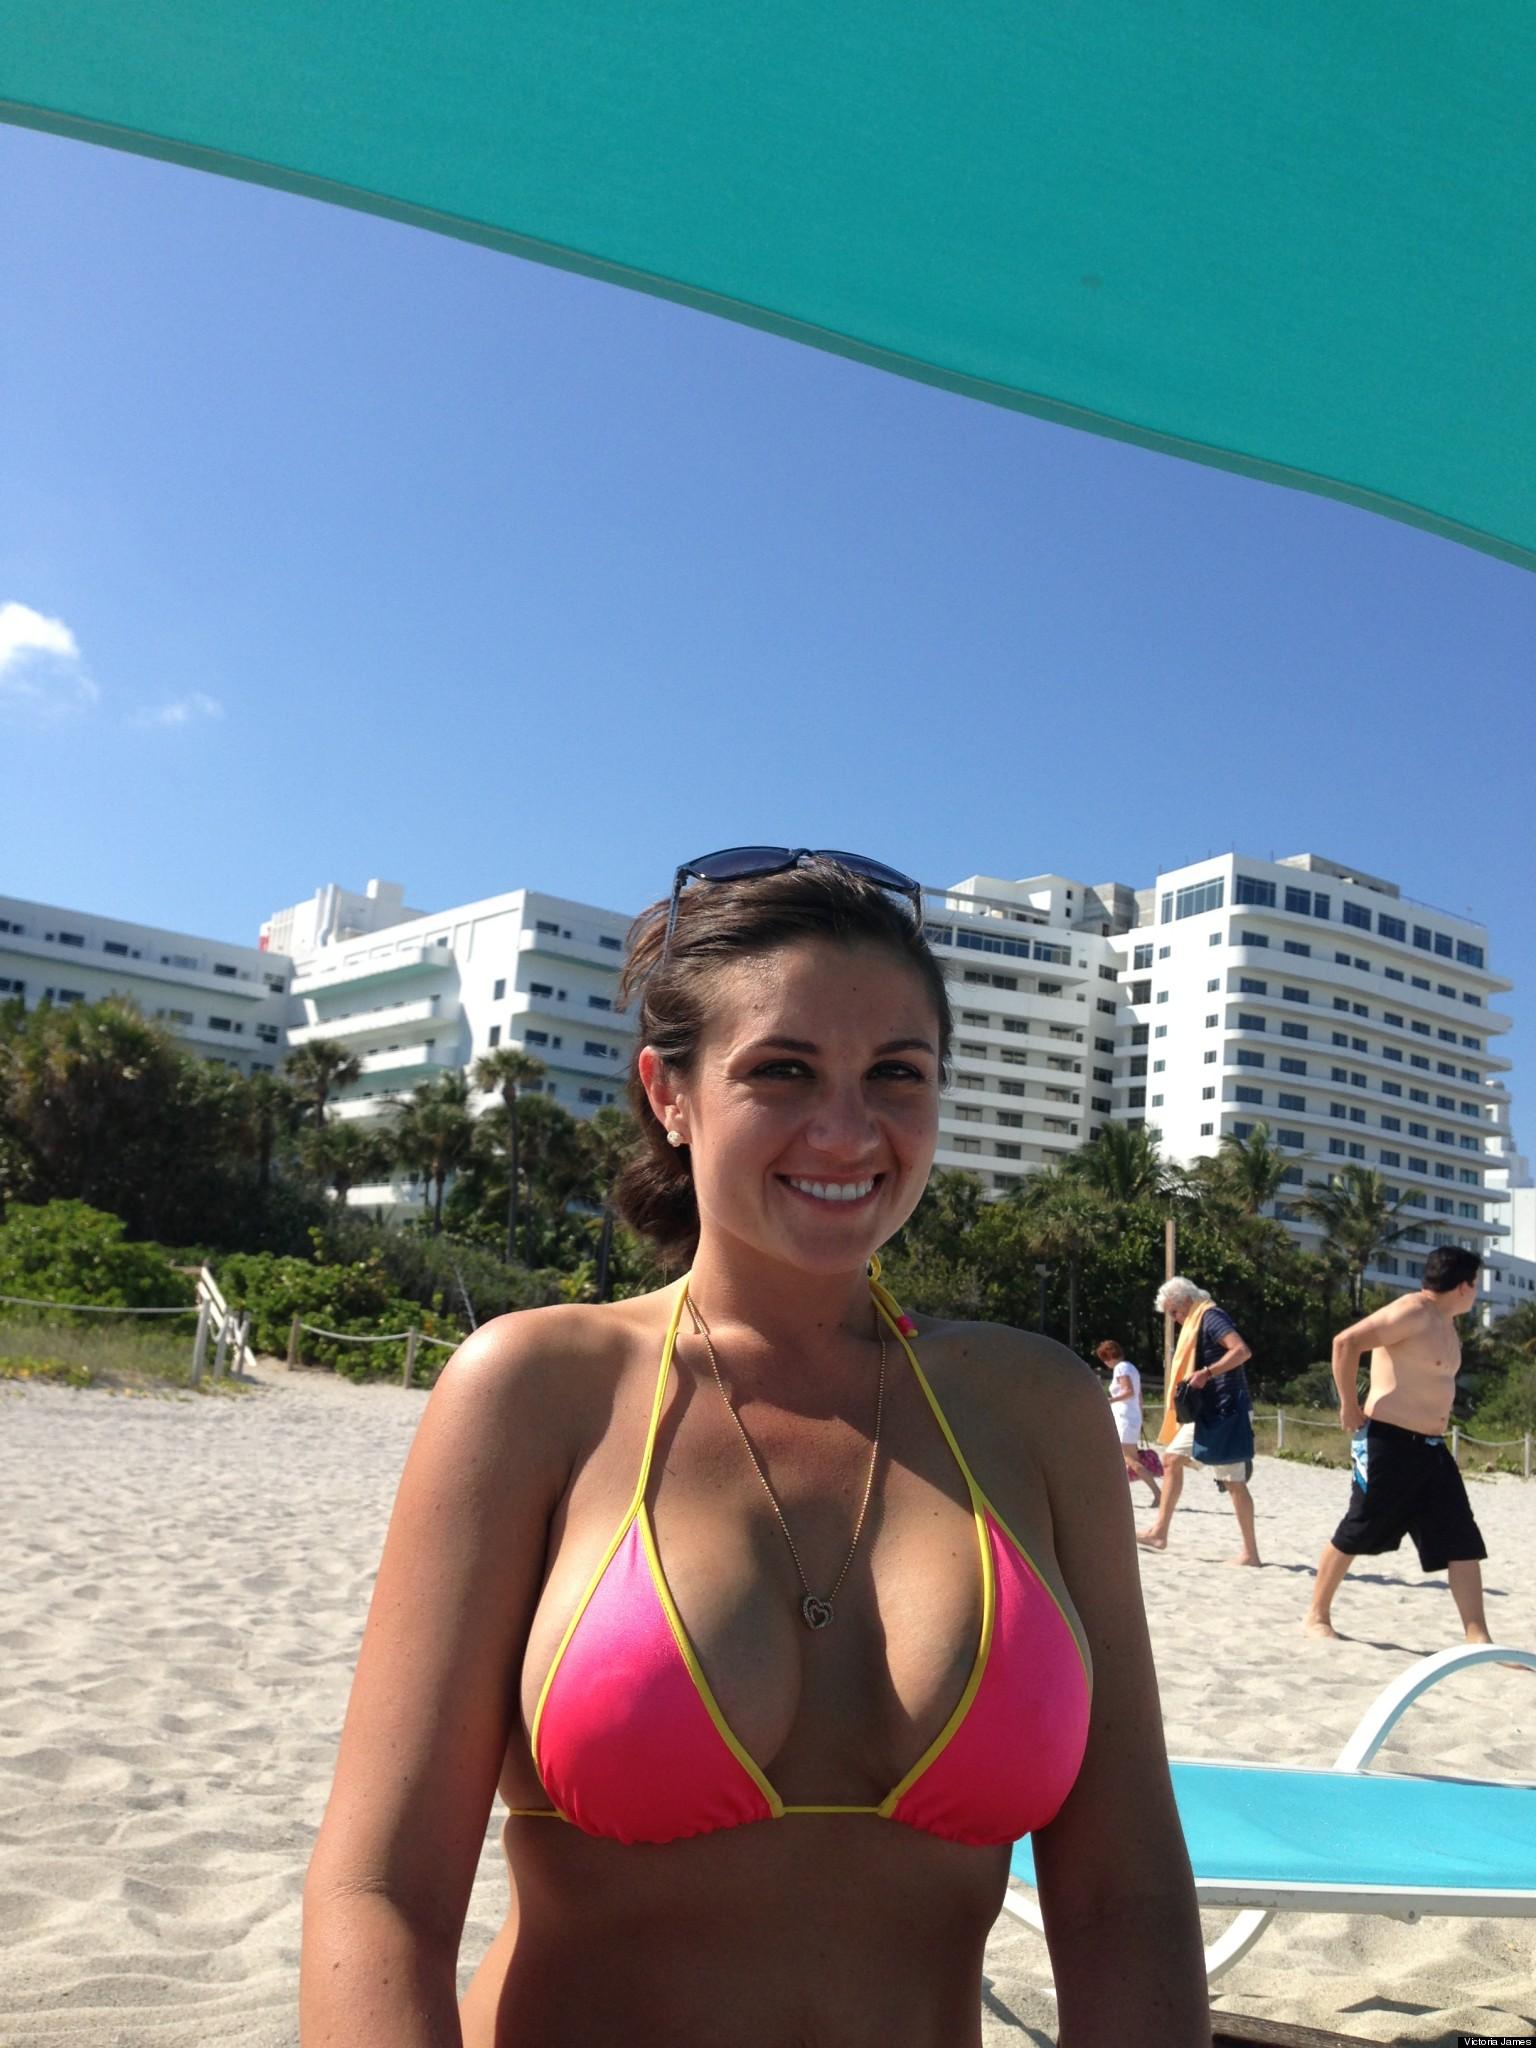 NEW PHOTOS: Bikini Teacher Basks In Newfound Fame